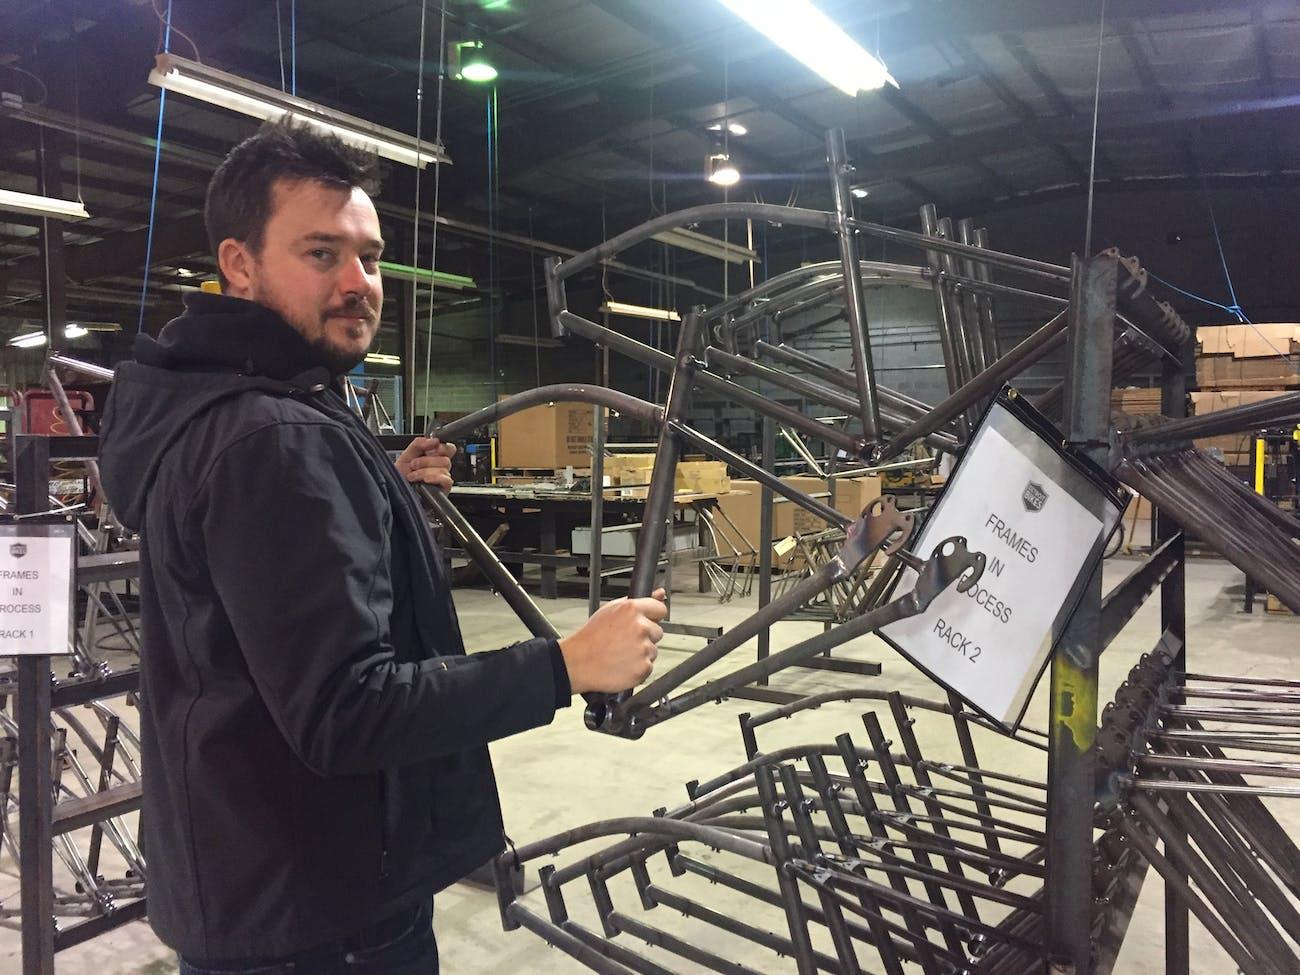 Pashak at the Detroit Bikes factory.